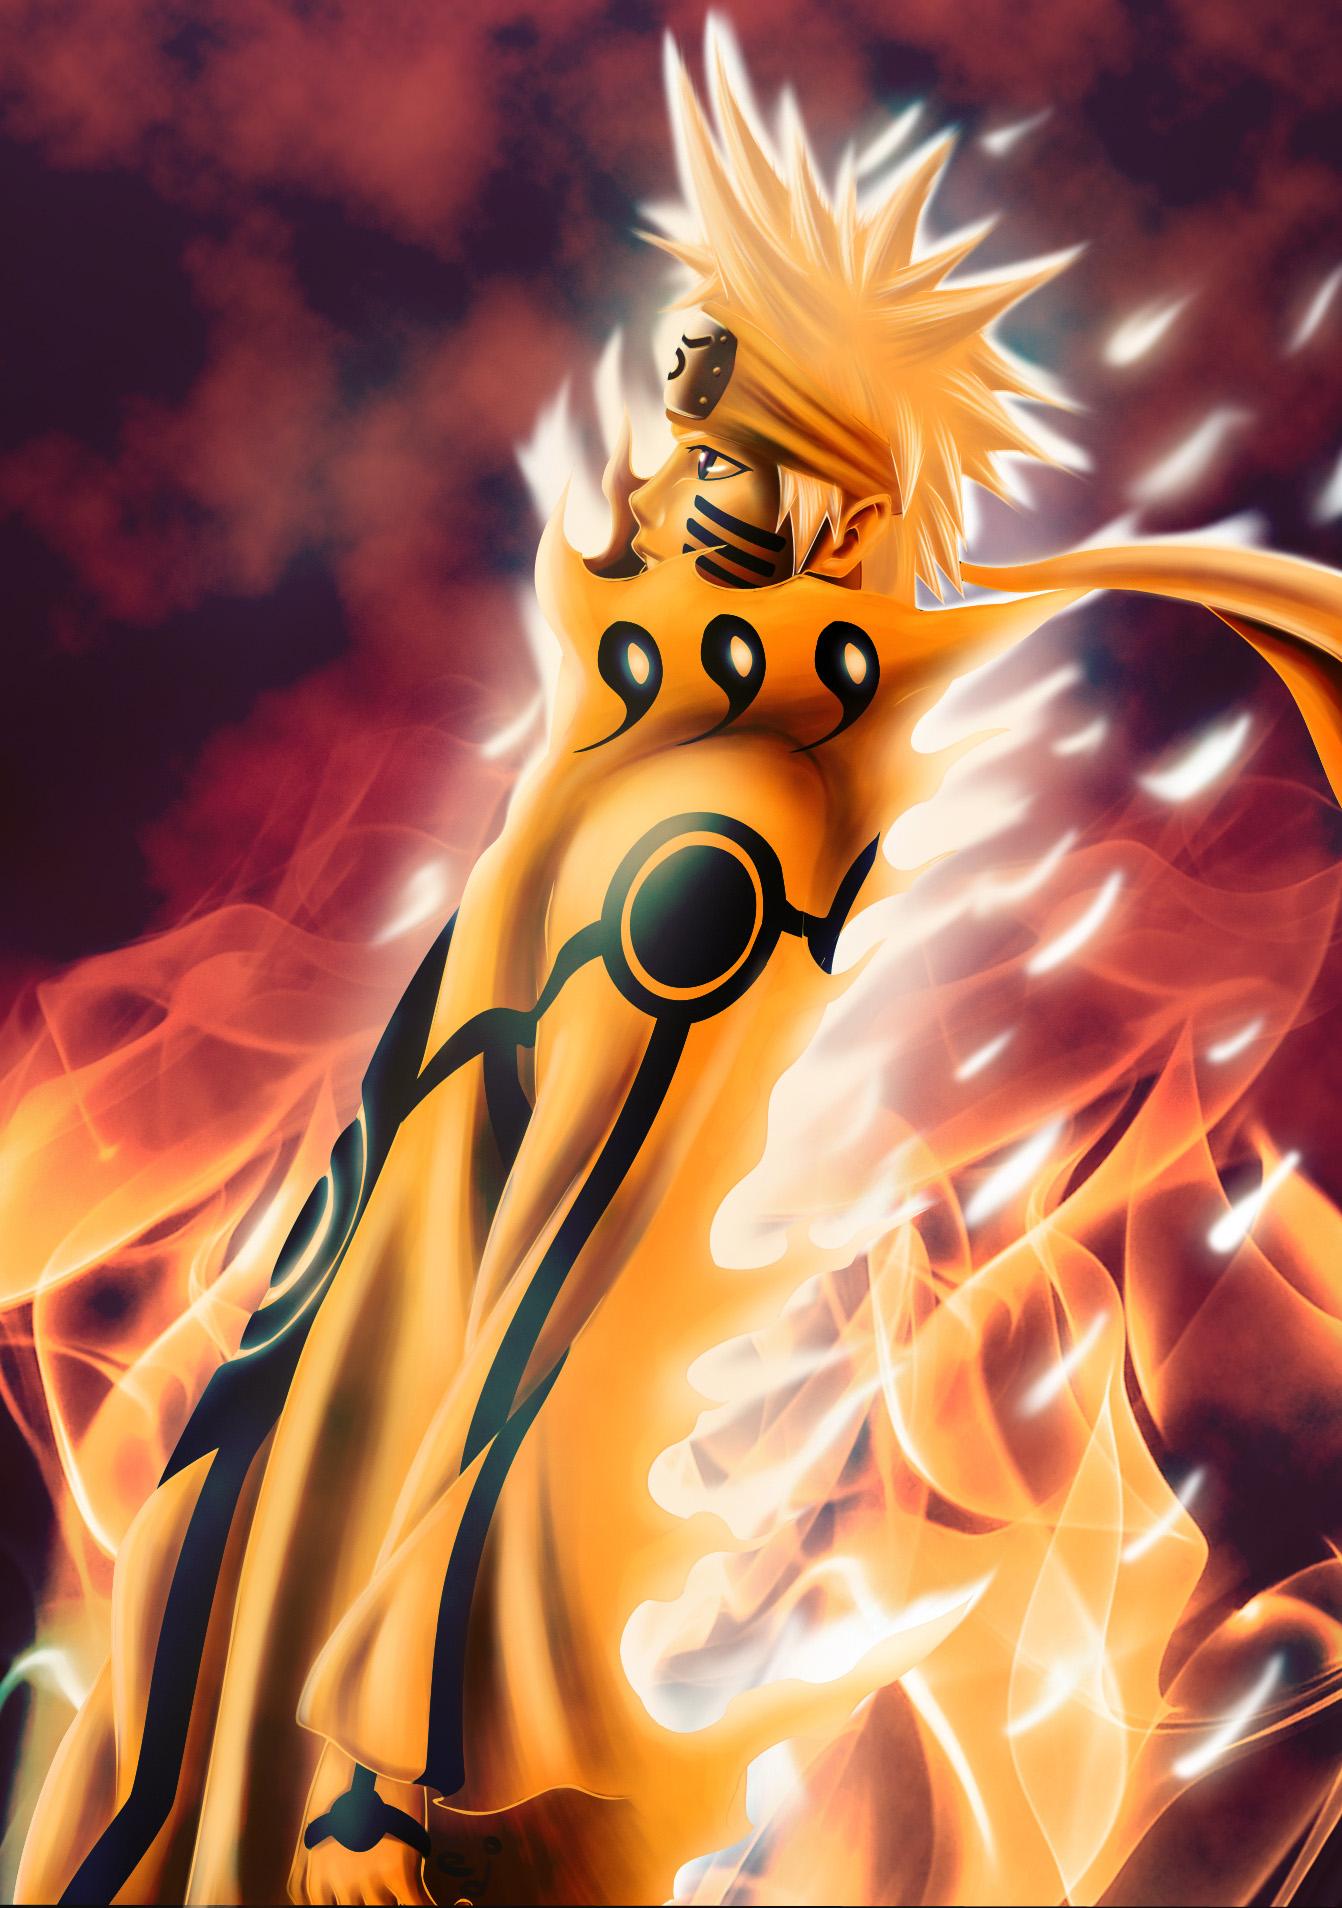 Naruto's Bijuu Mode Archives - Daily Anime Art